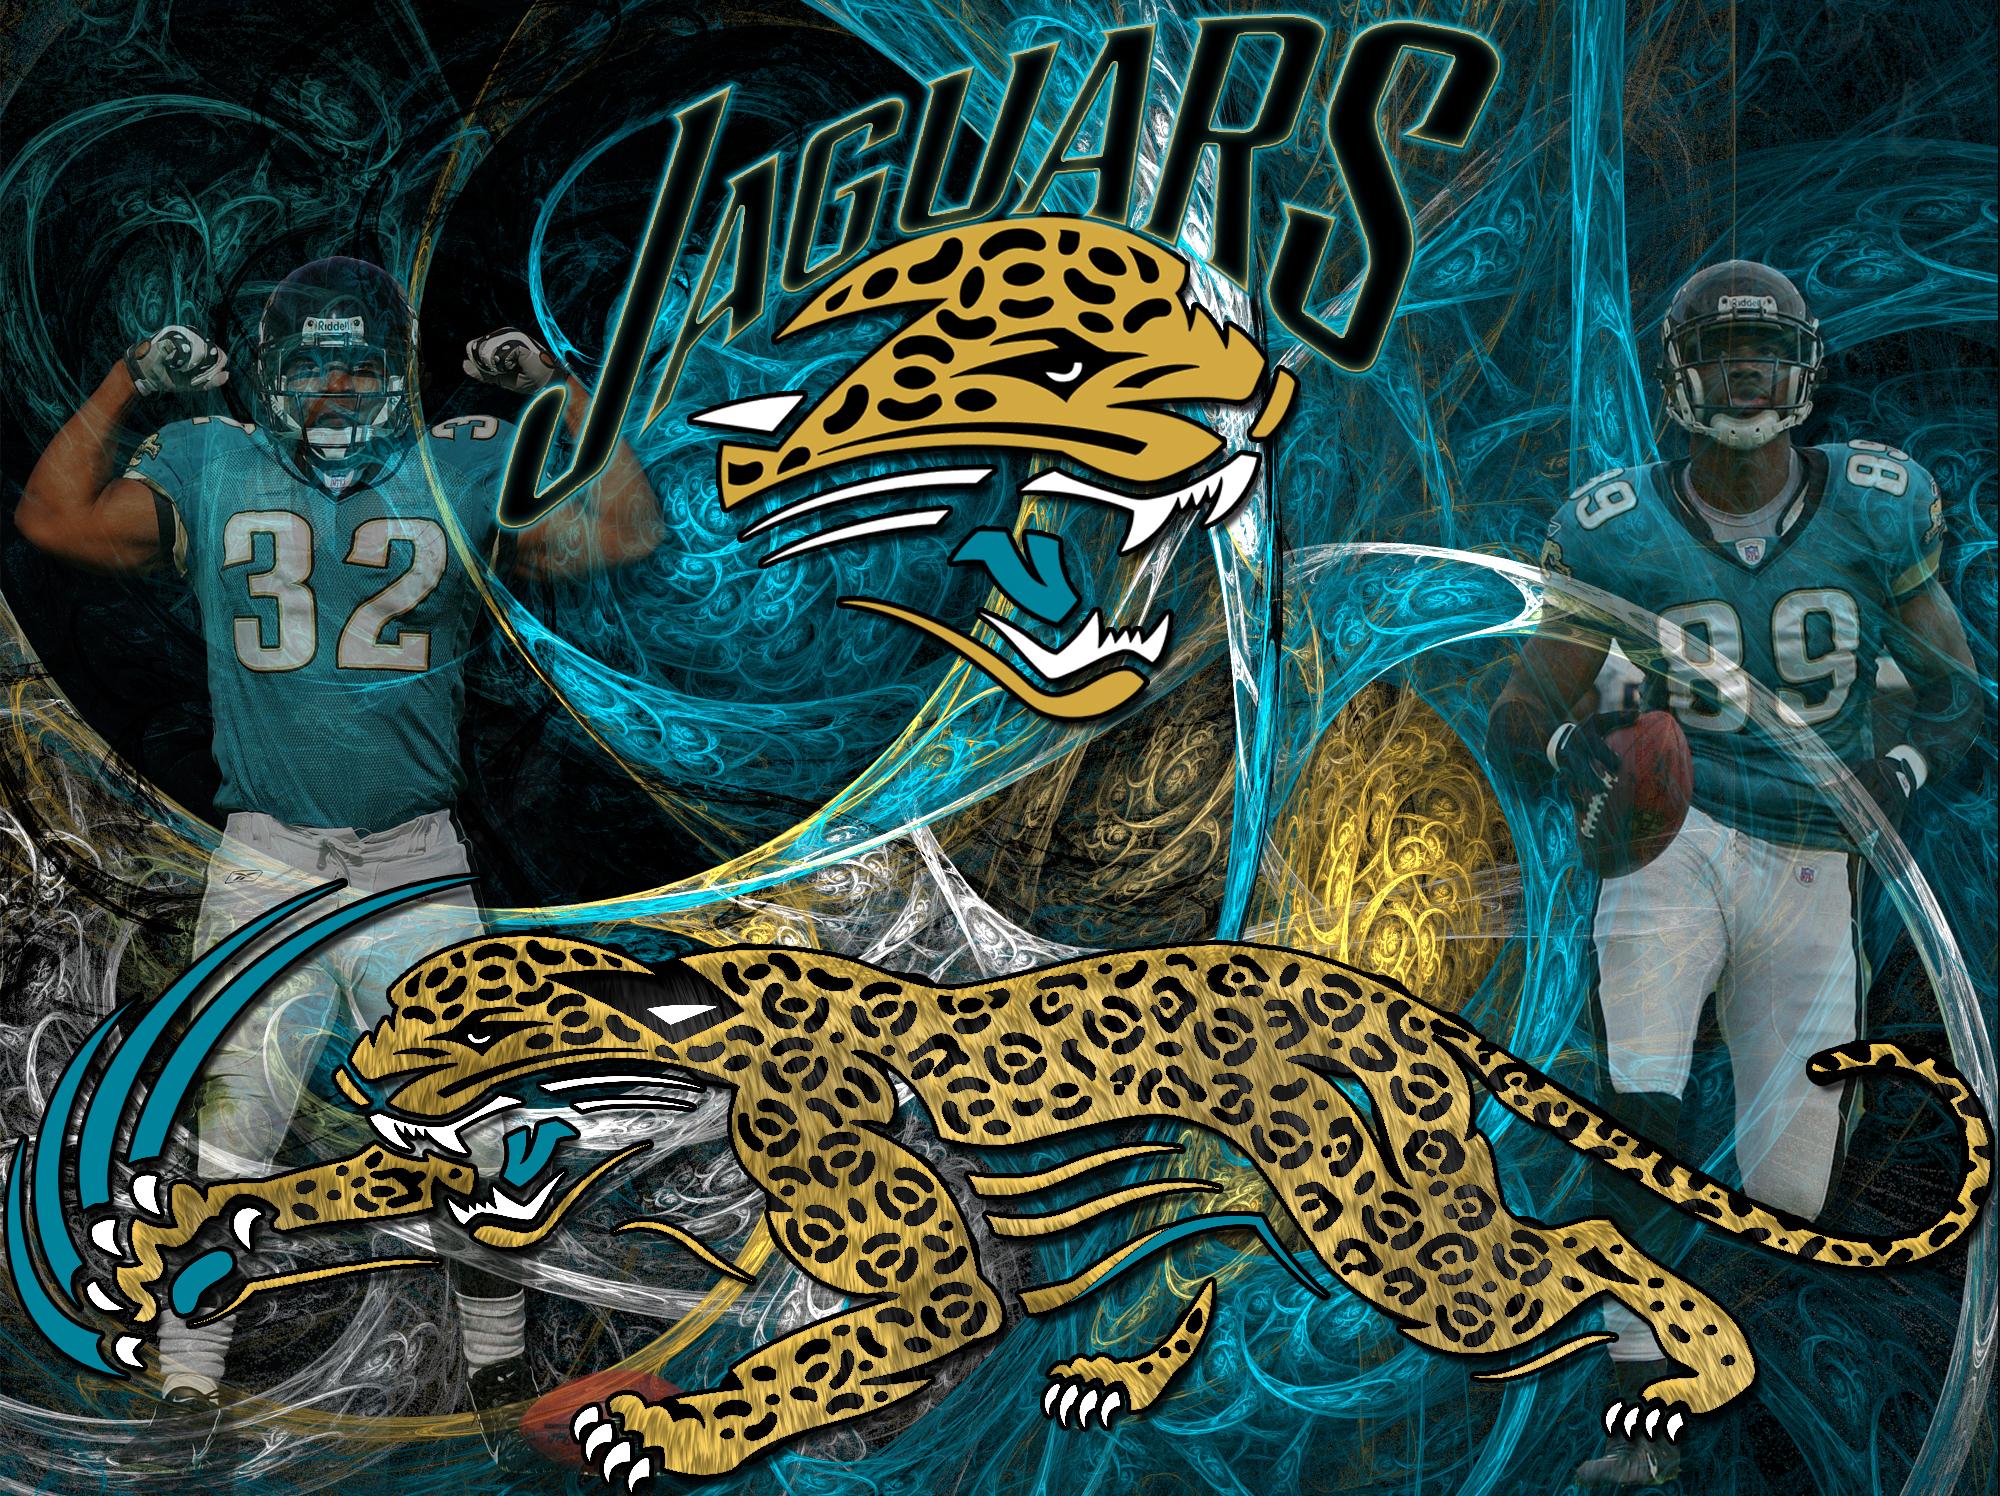 Jacksonville Jaguars Wicked Wallpaper Download Wallpaper 2000x1496